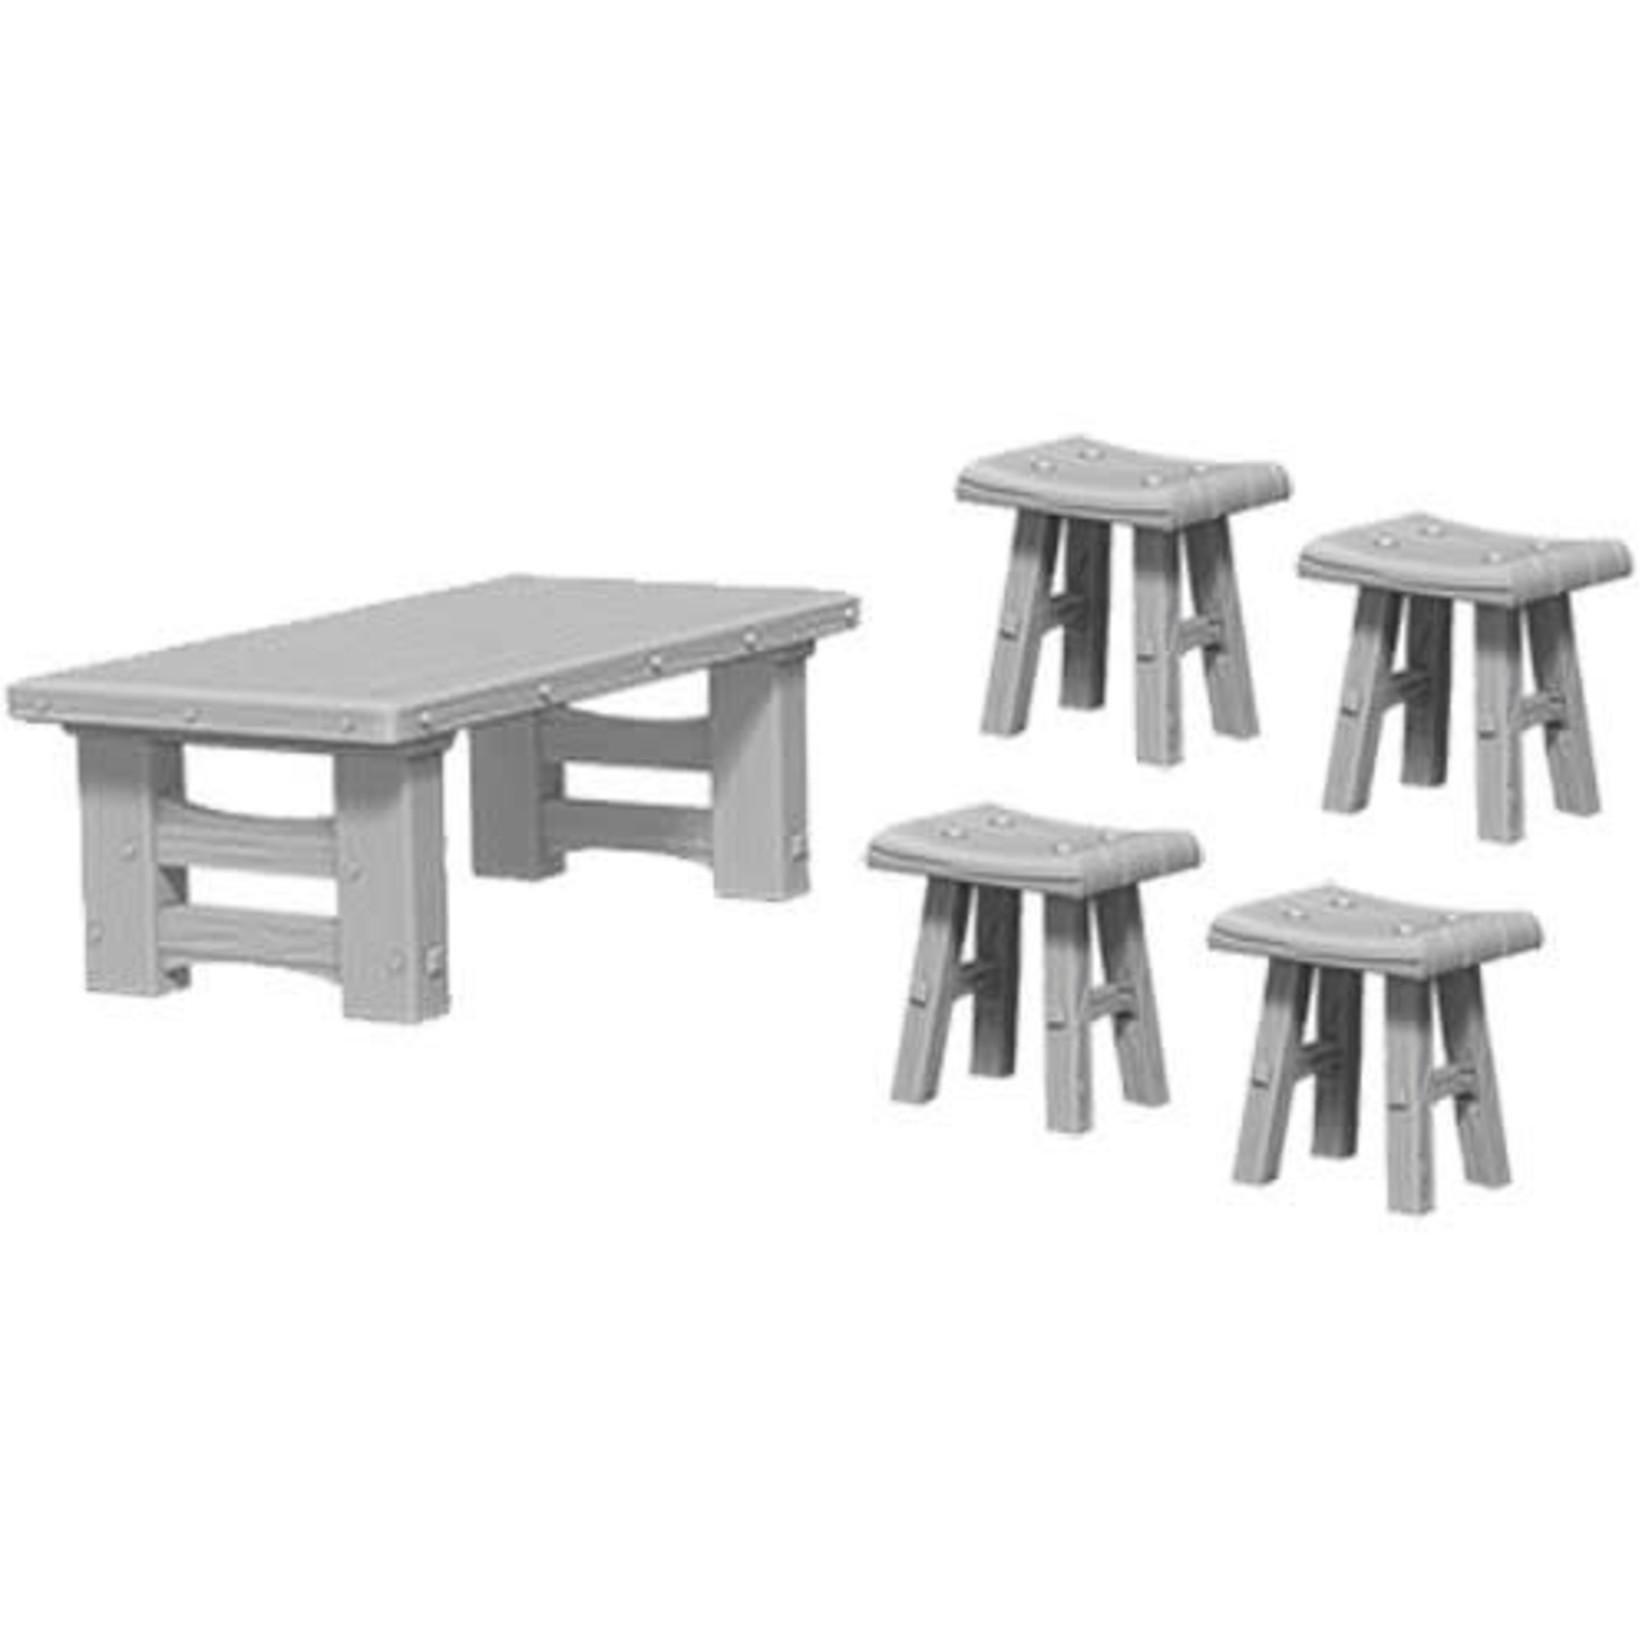 D&D Unpainted Minis: Wooden Table & Stools